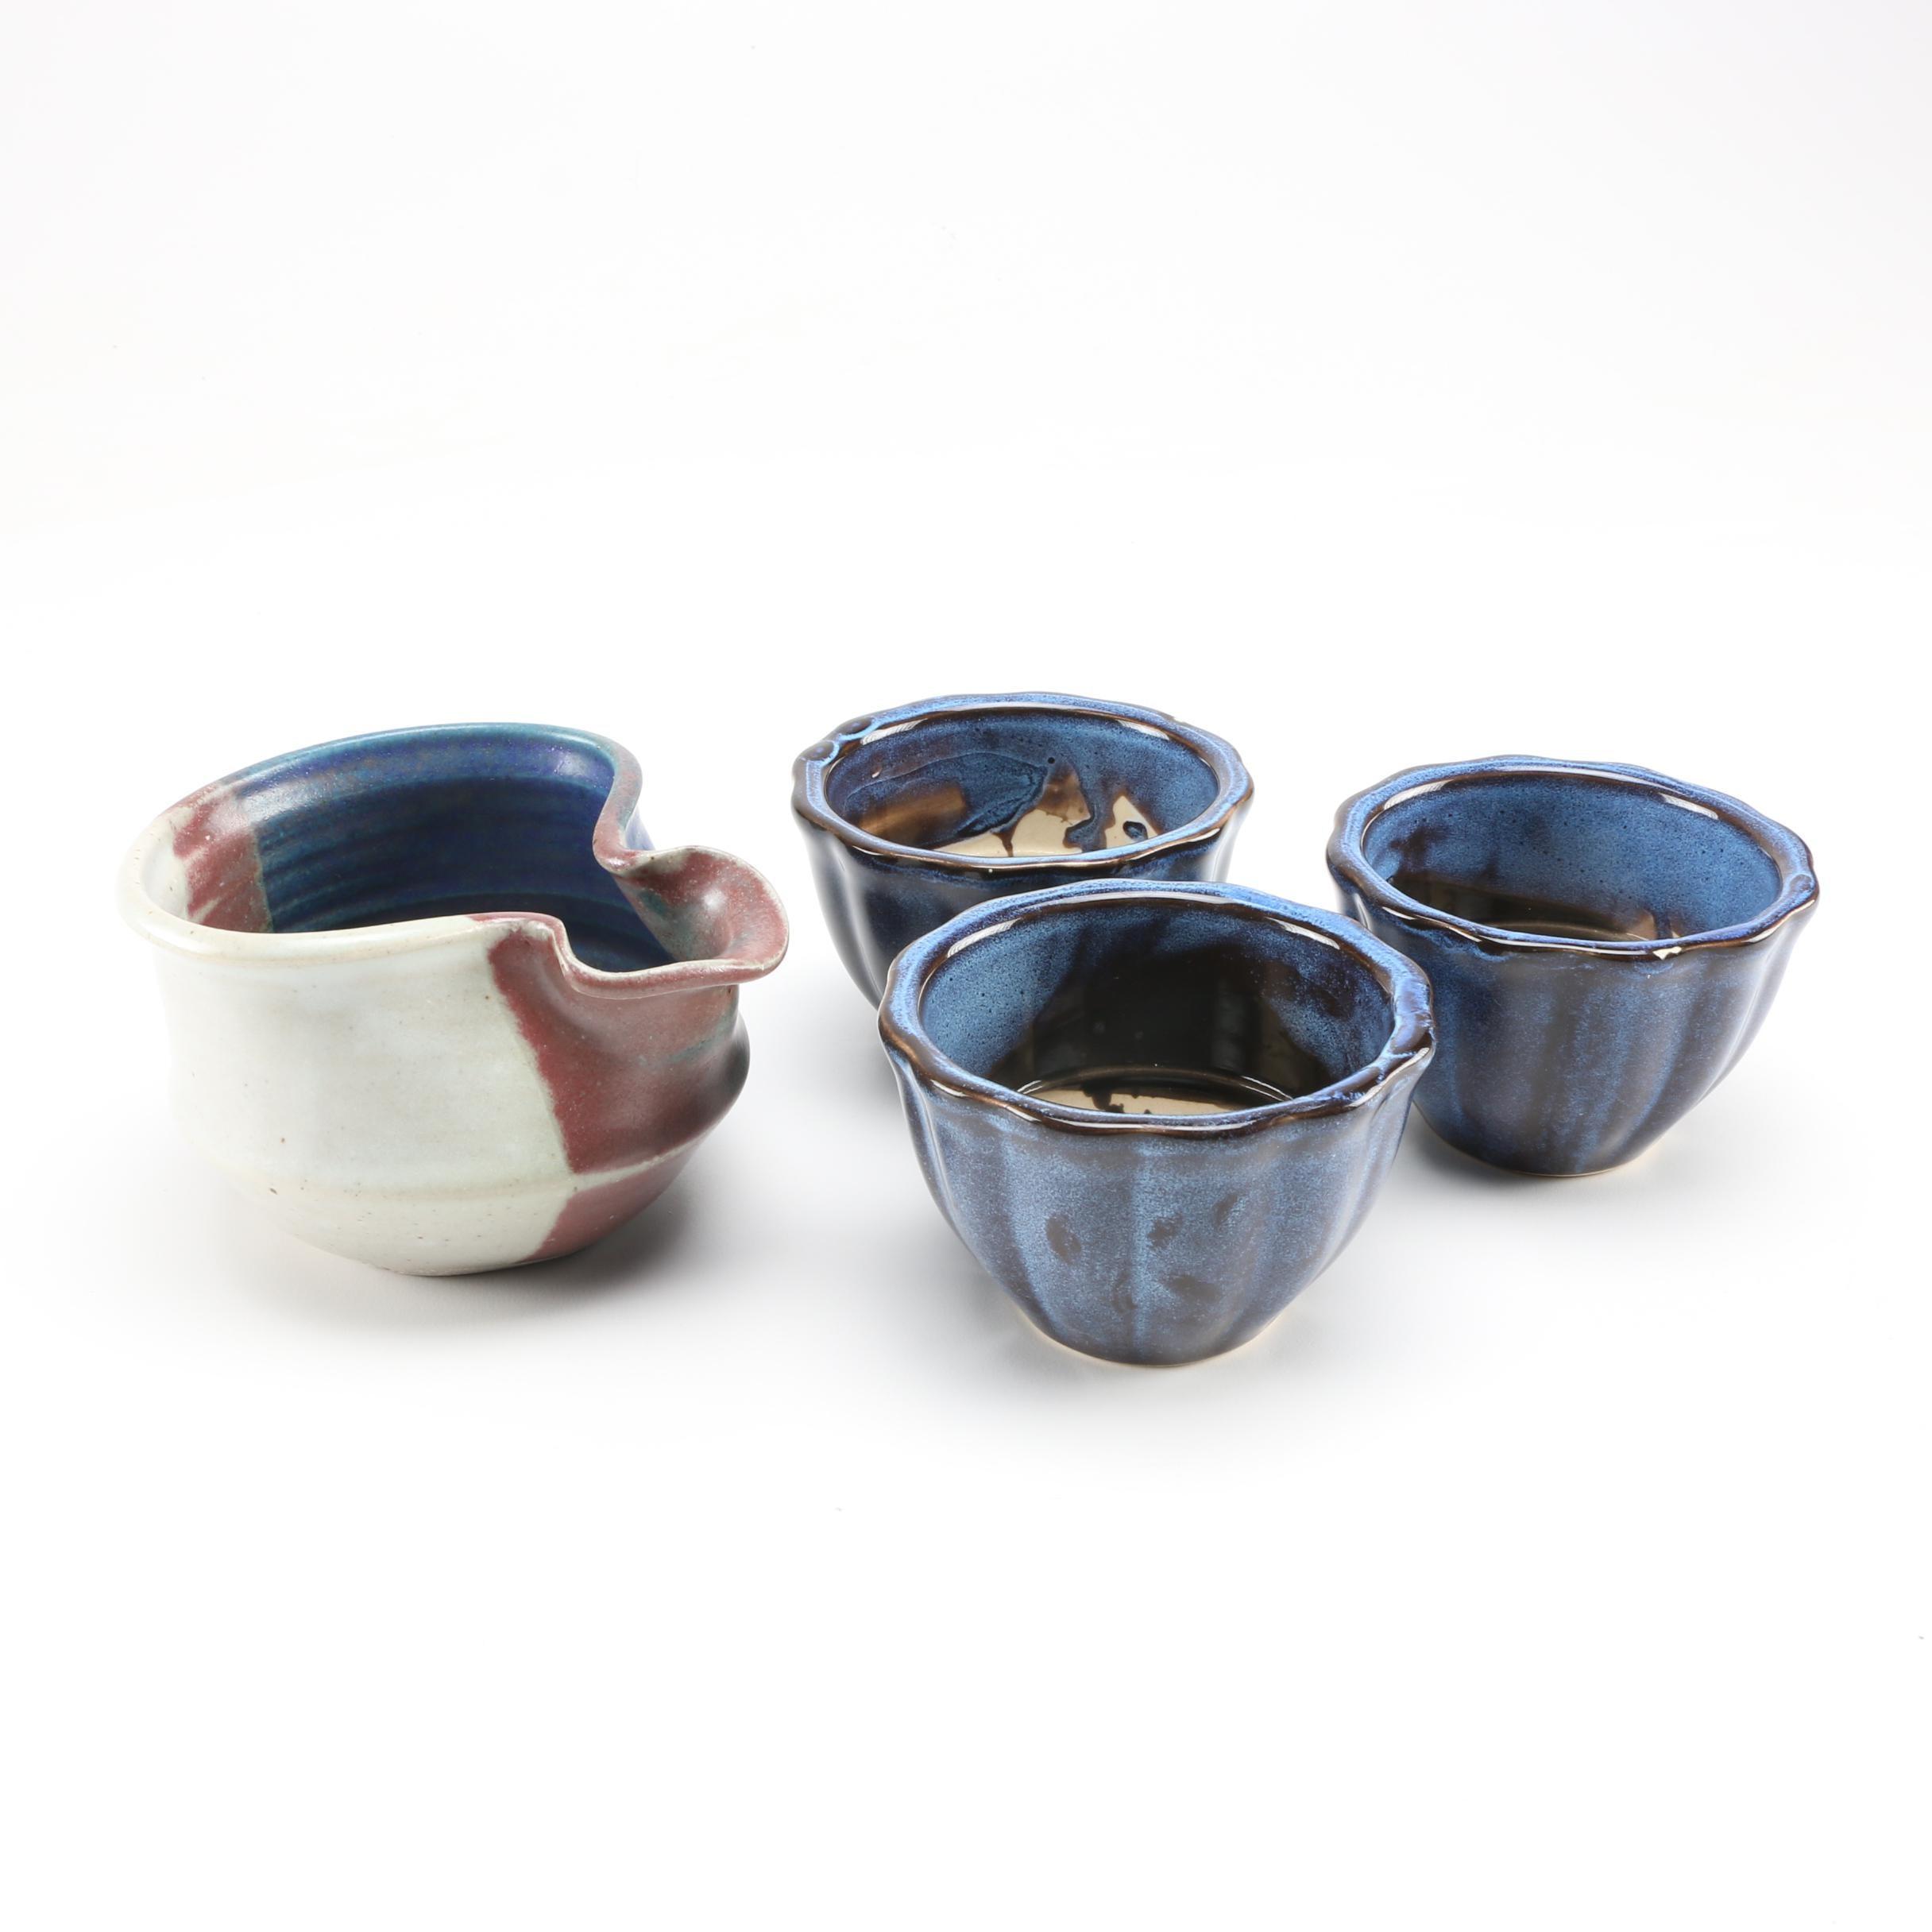 Hand Thrown Stoneware Batter Bowl and Bowl Set